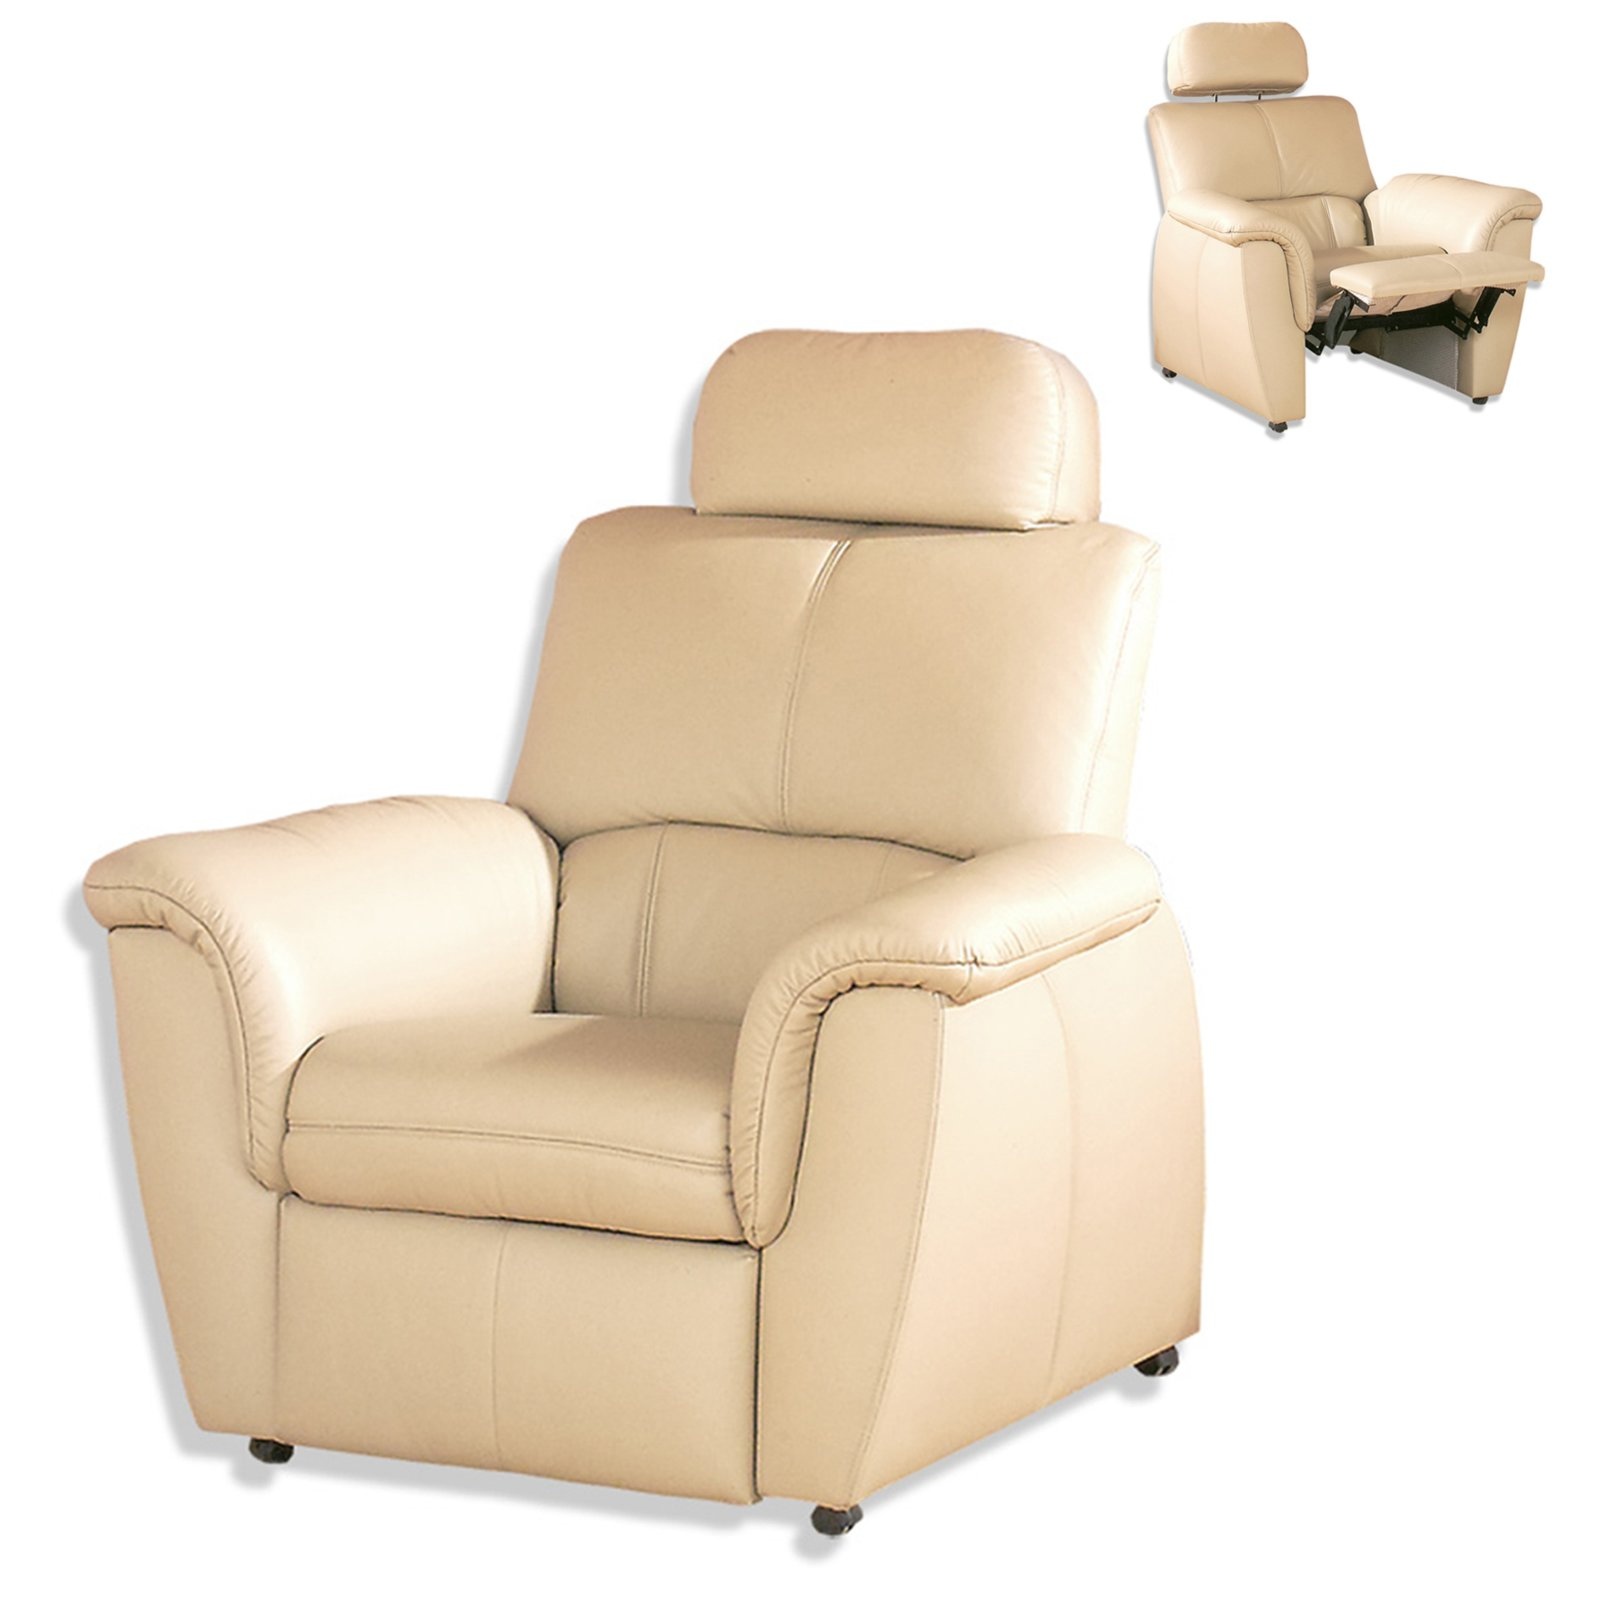 ledersessel natur mit funktion und kopfst tze fernseh relaxsessel sessel hocker. Black Bedroom Furniture Sets. Home Design Ideas